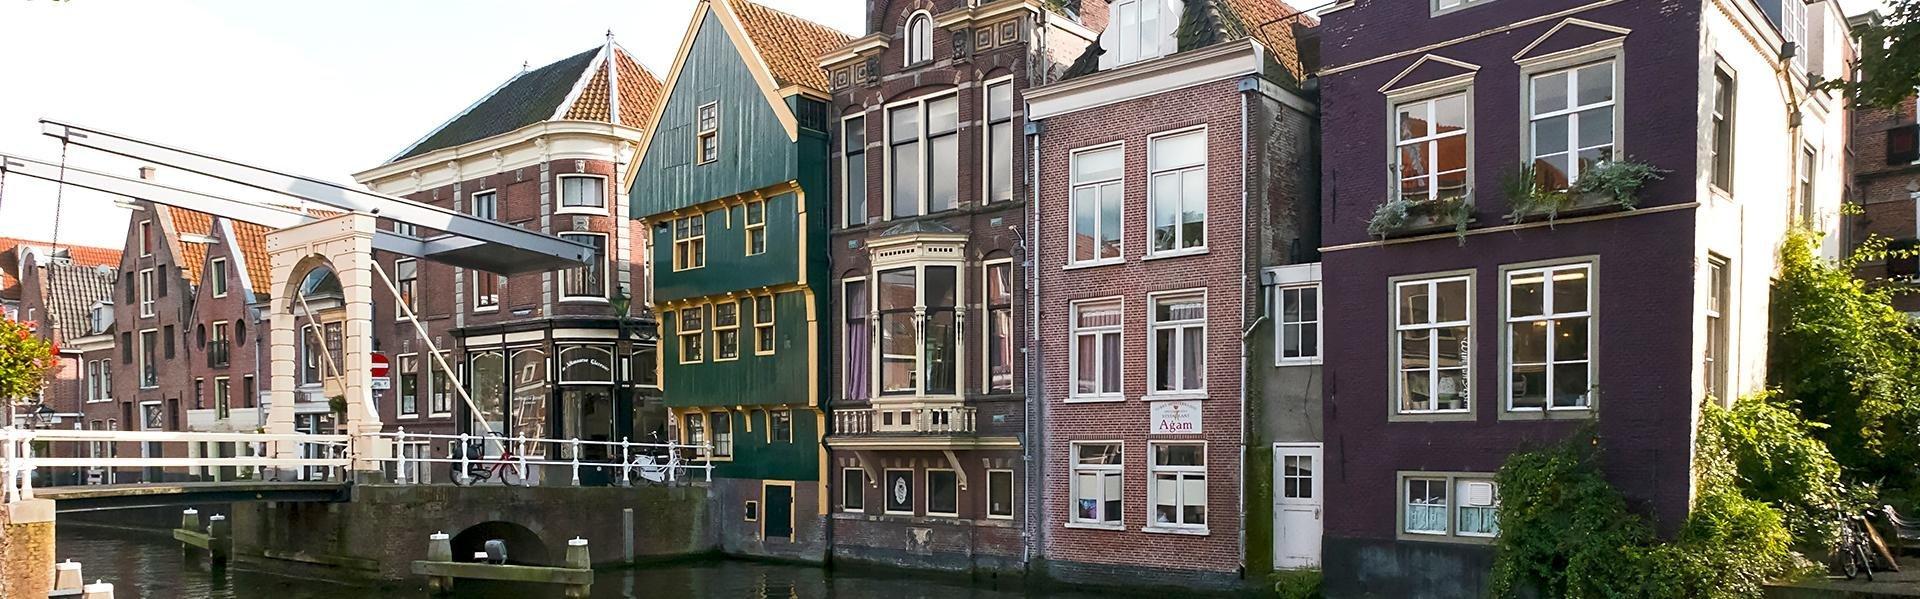 Alkmaar, Nederland